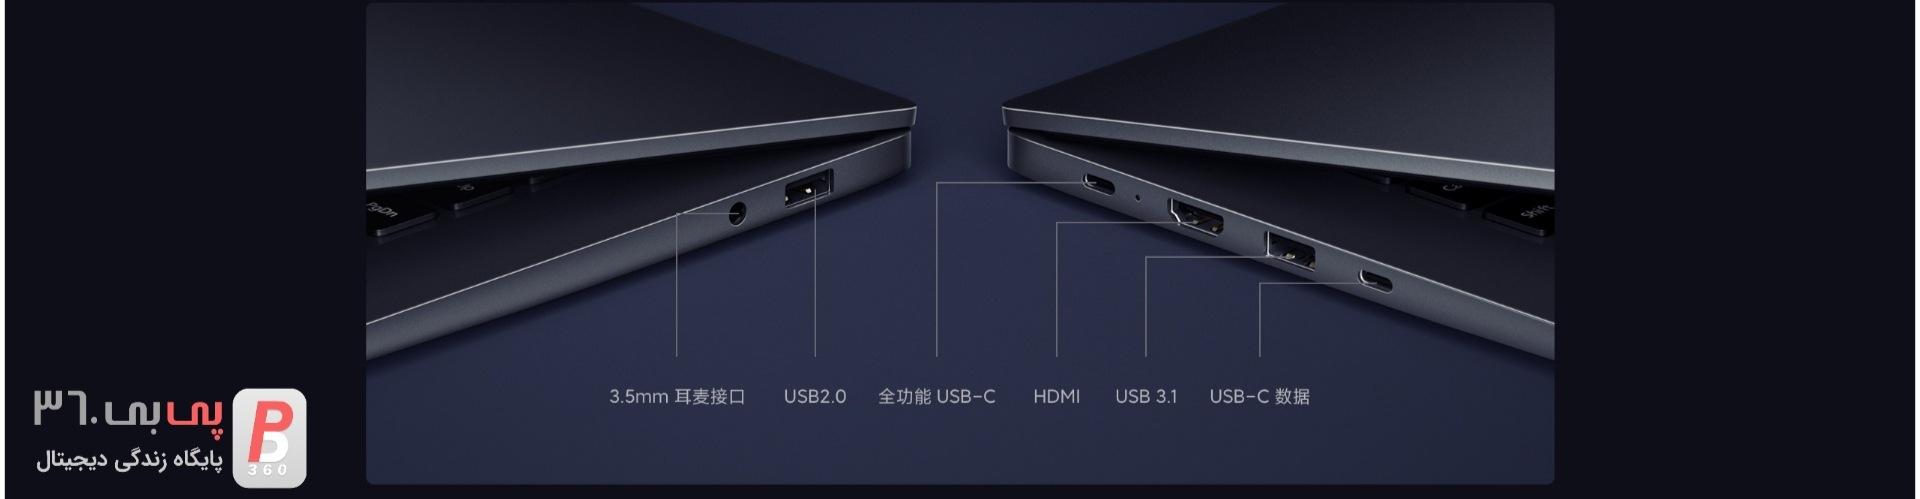 لیست قیمت لپ تاپ شیائومی